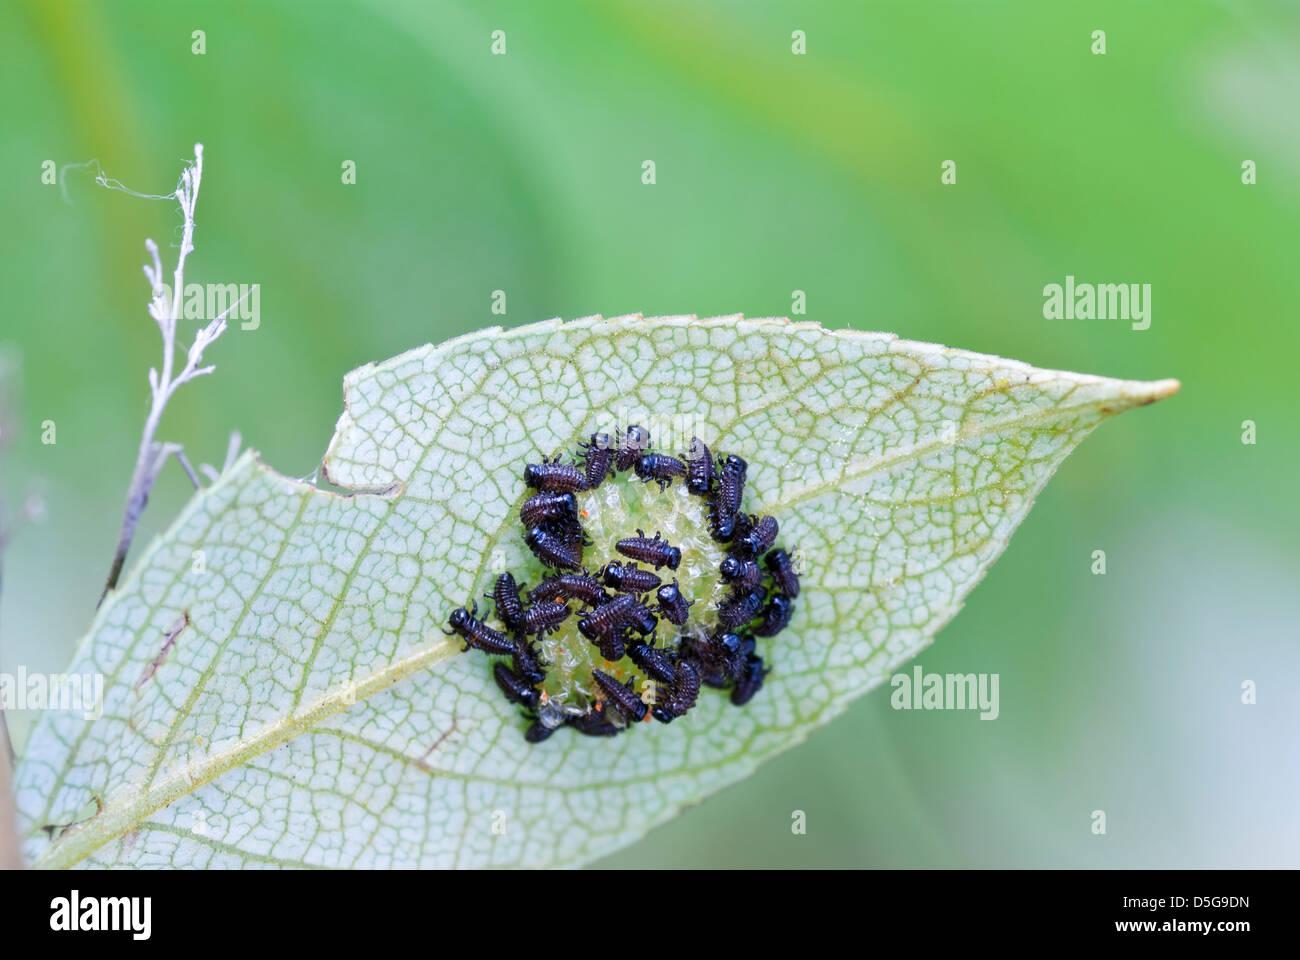 hatch with egg of little larva on leaf - Stock Image